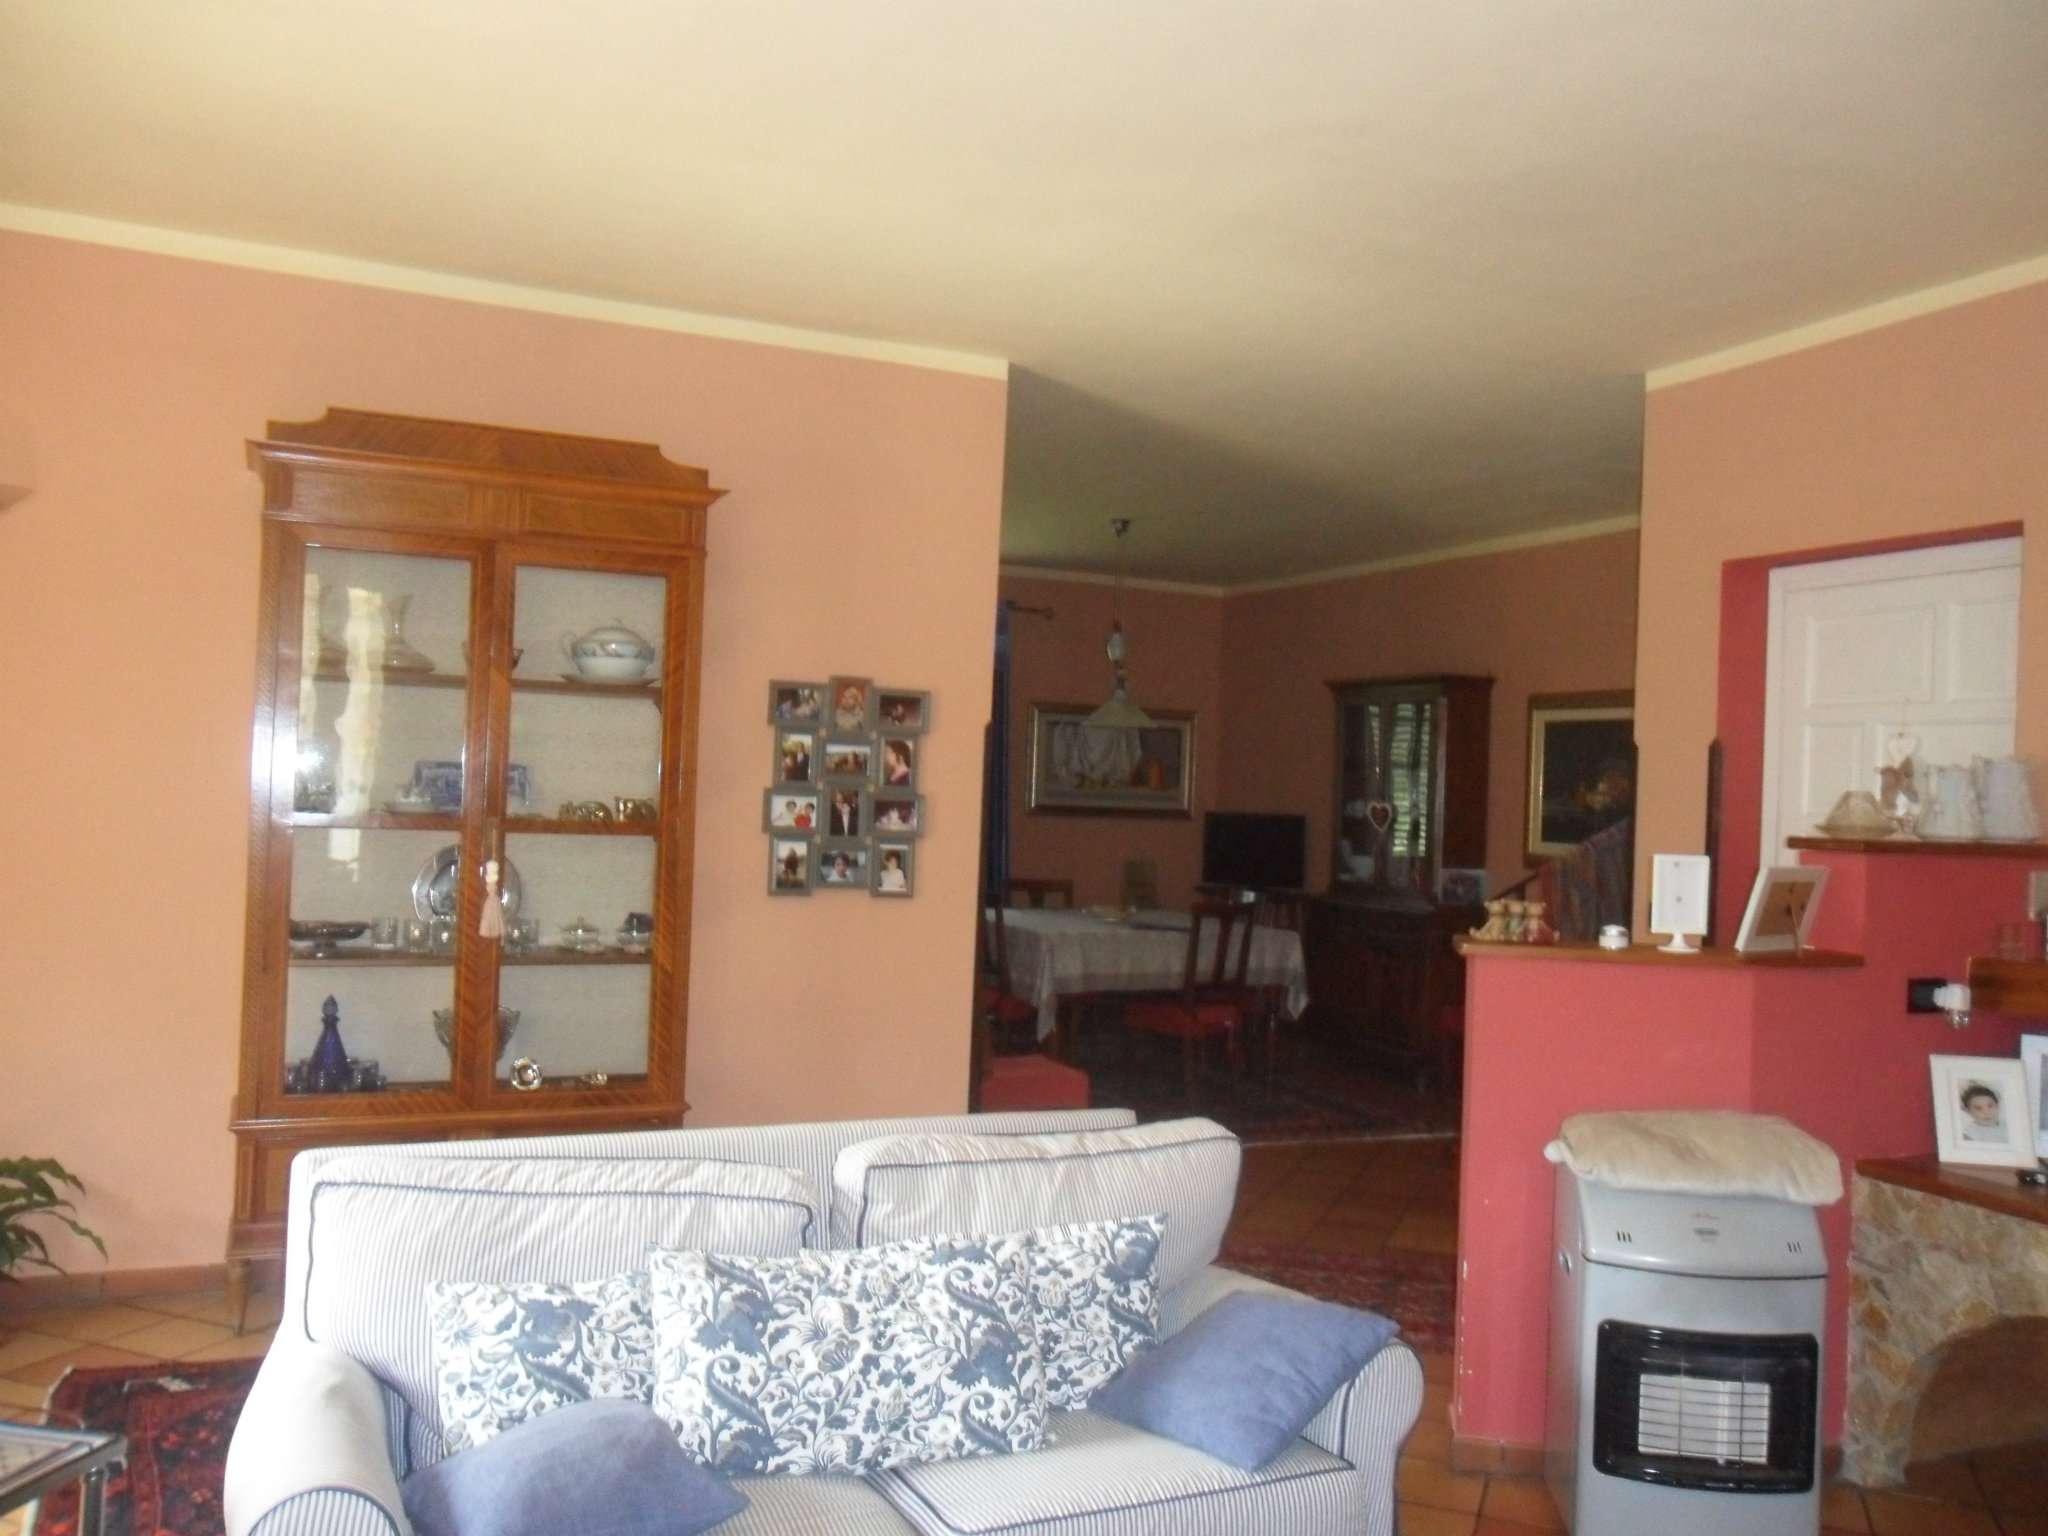 Appartamento a cinisi (pa). cerco case   abitativi a cinisi (pa ...